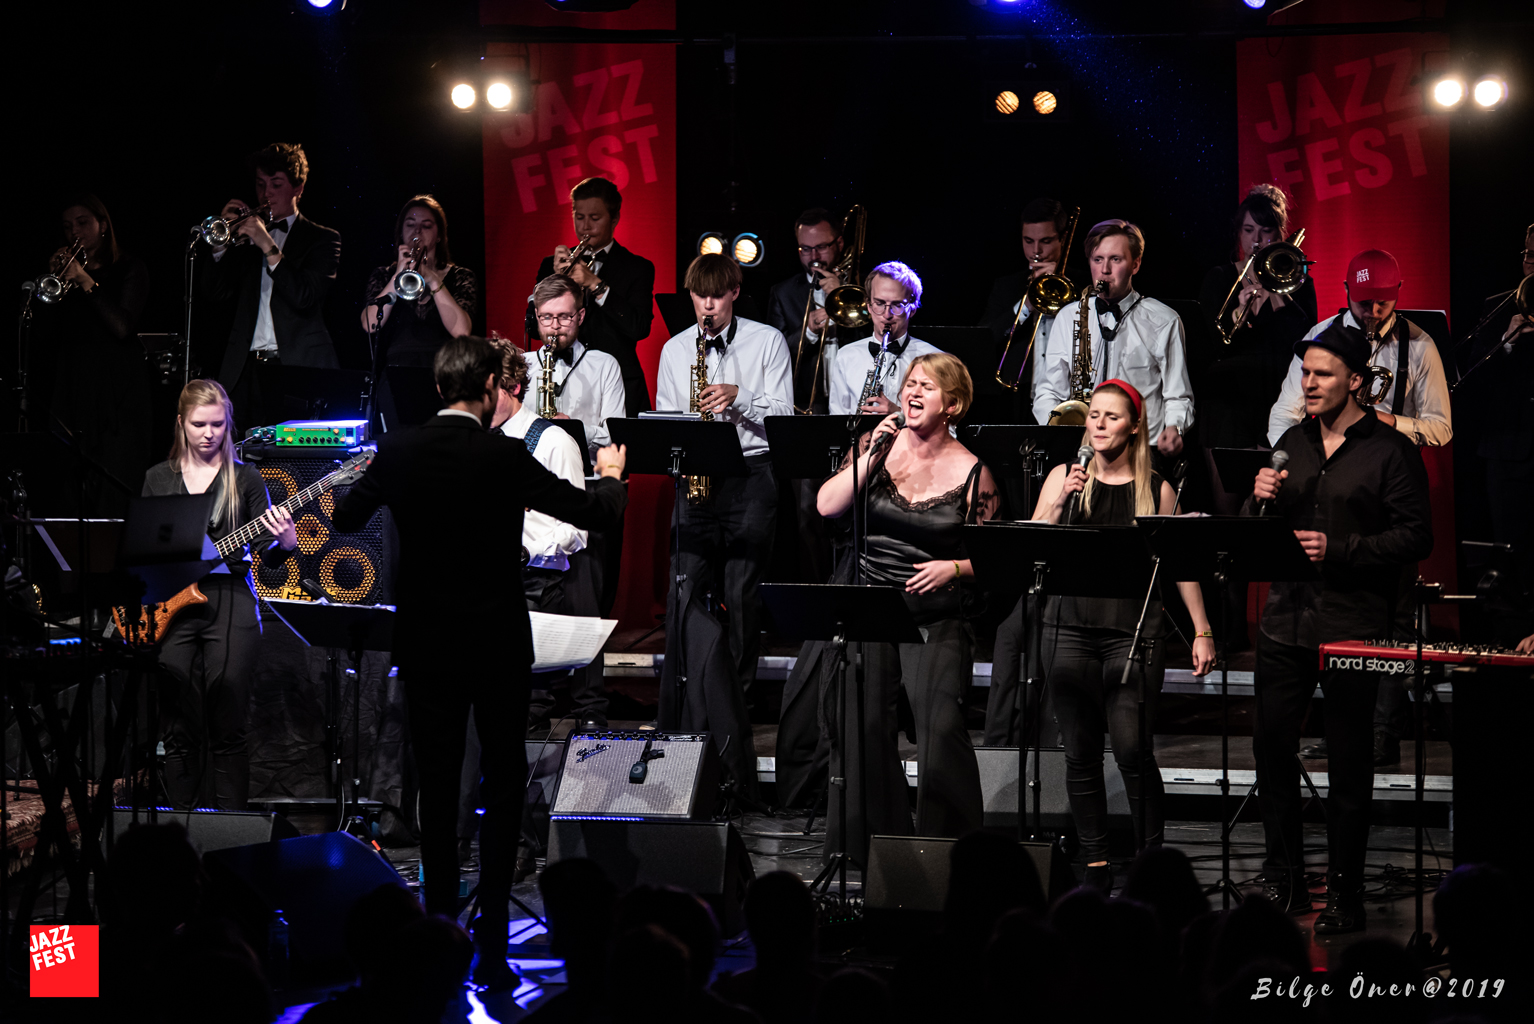 110519-S.-Møller-Beats-&-Big-Band-@-Studentsammfunnet-foto-Bilge-Öner-14.jpg